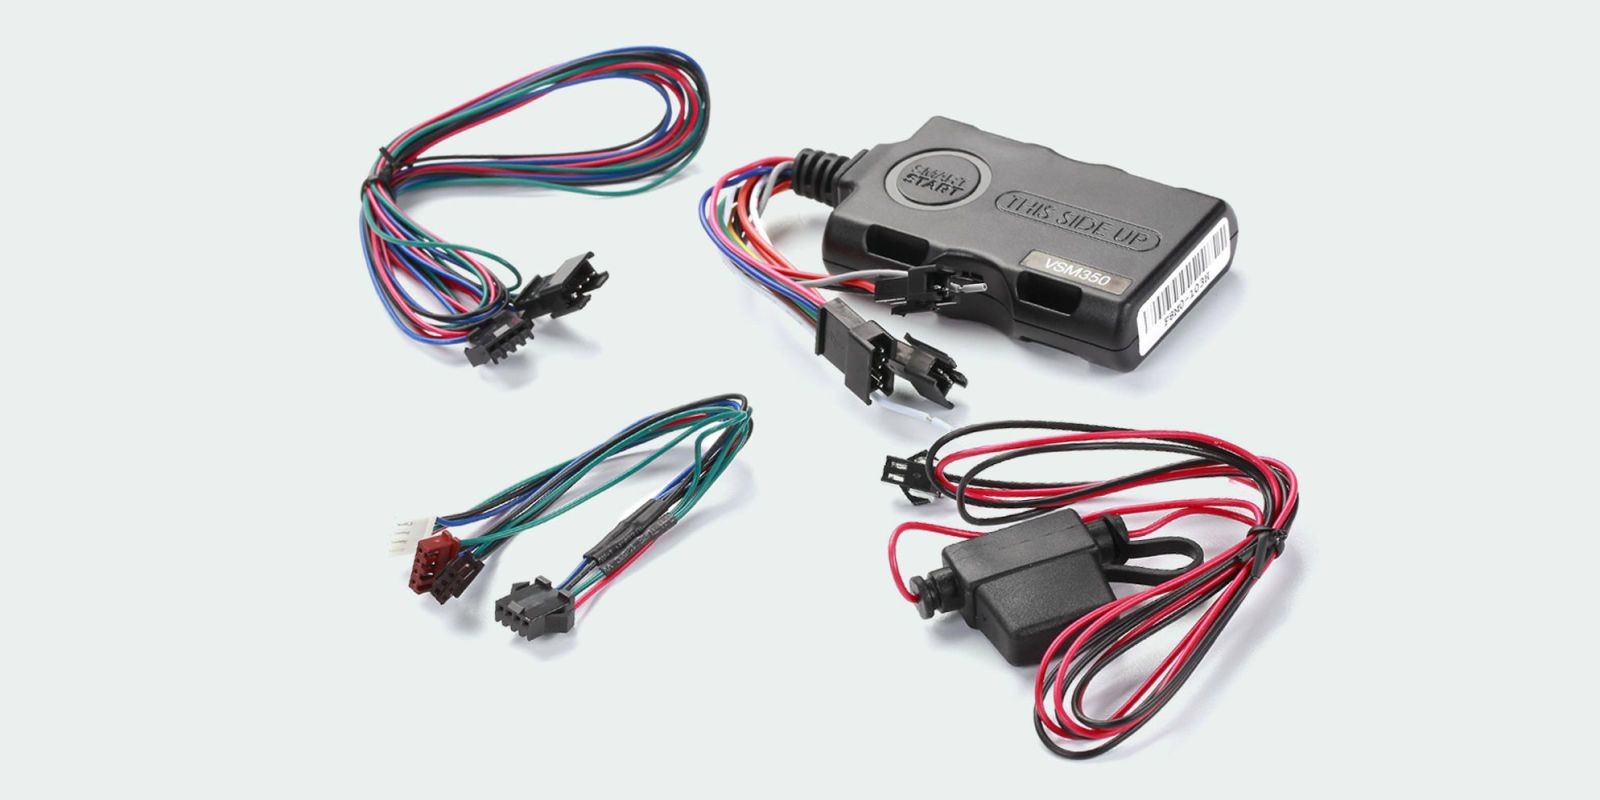 Aftermarket Car Alarm Diagram Clifford 8000 Schematic Diagrams Systems Wire Data Schema U2022